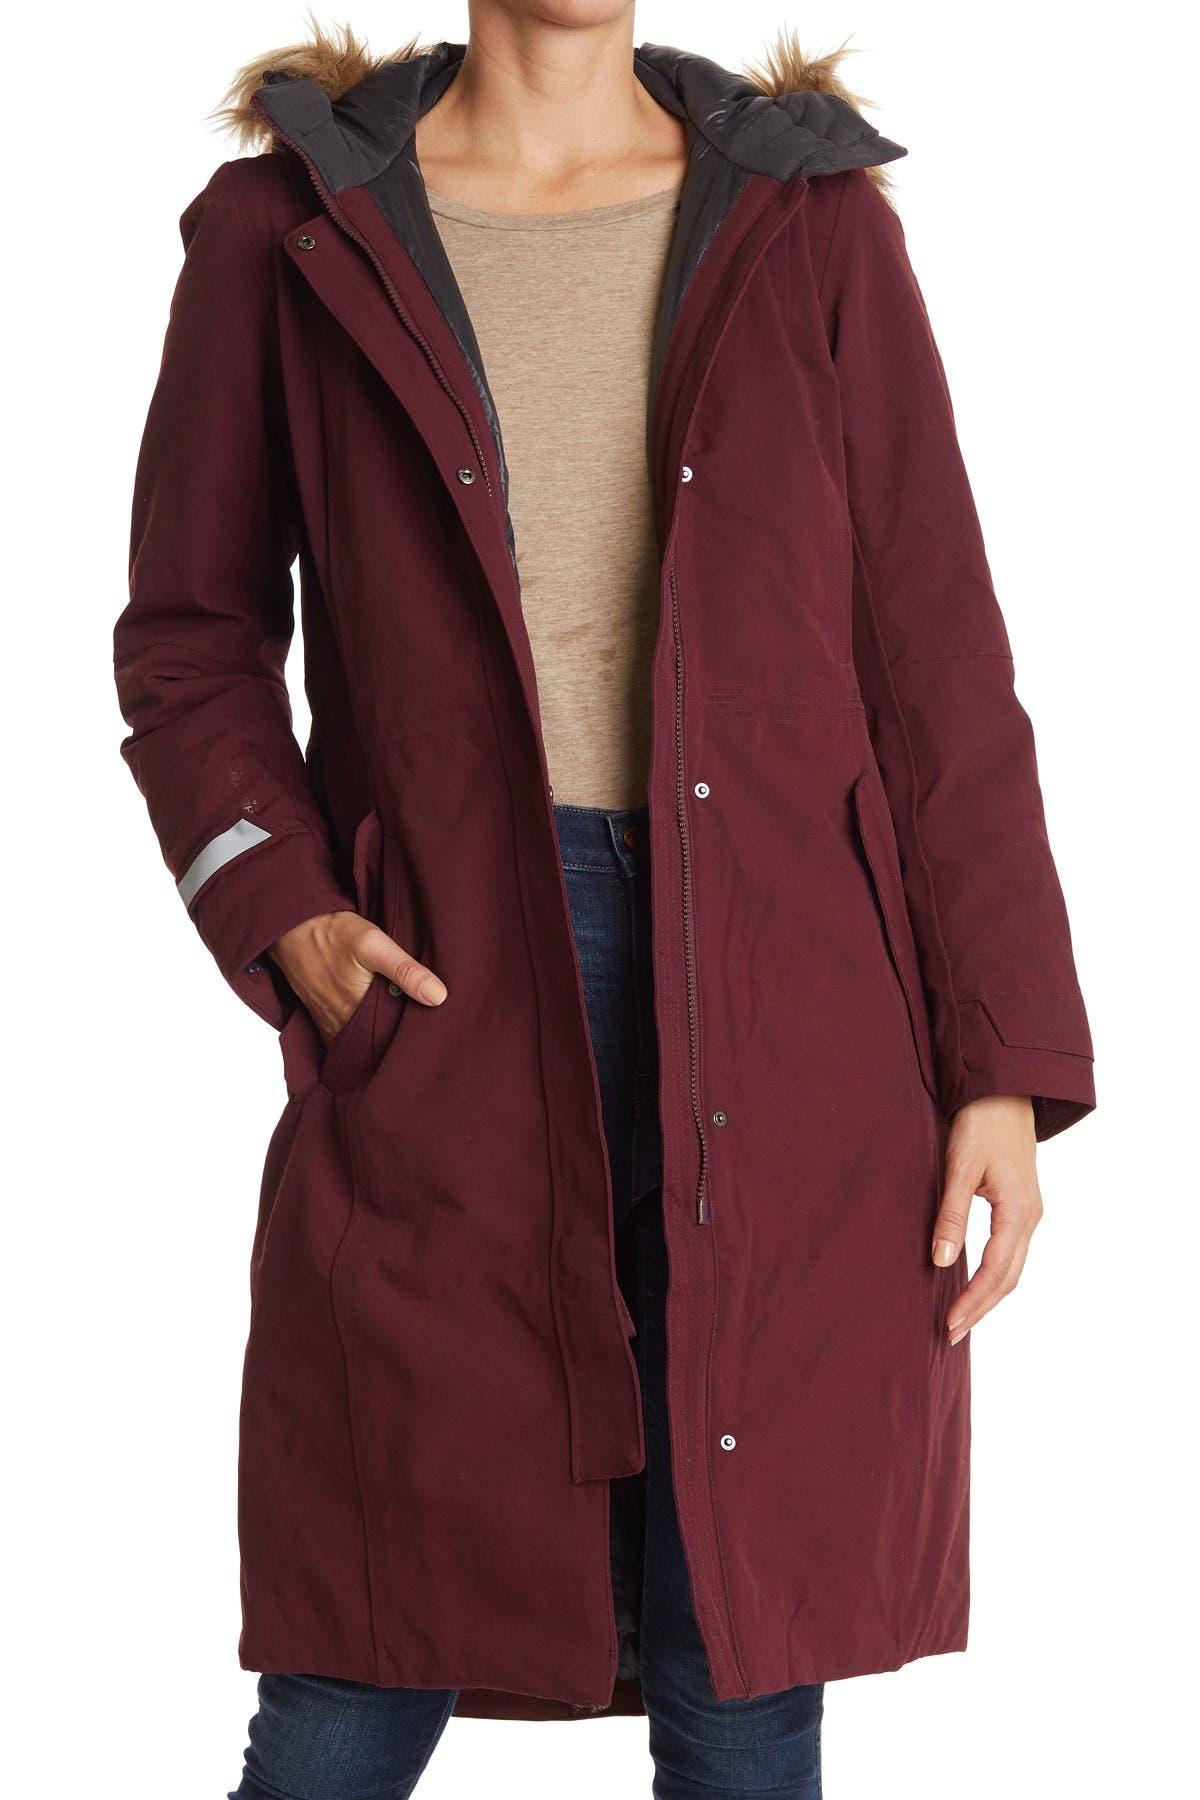 Image of Helly Hansen Vidda Faux Fur Trim Hood Waterproof Long Insulated Parka Jacket